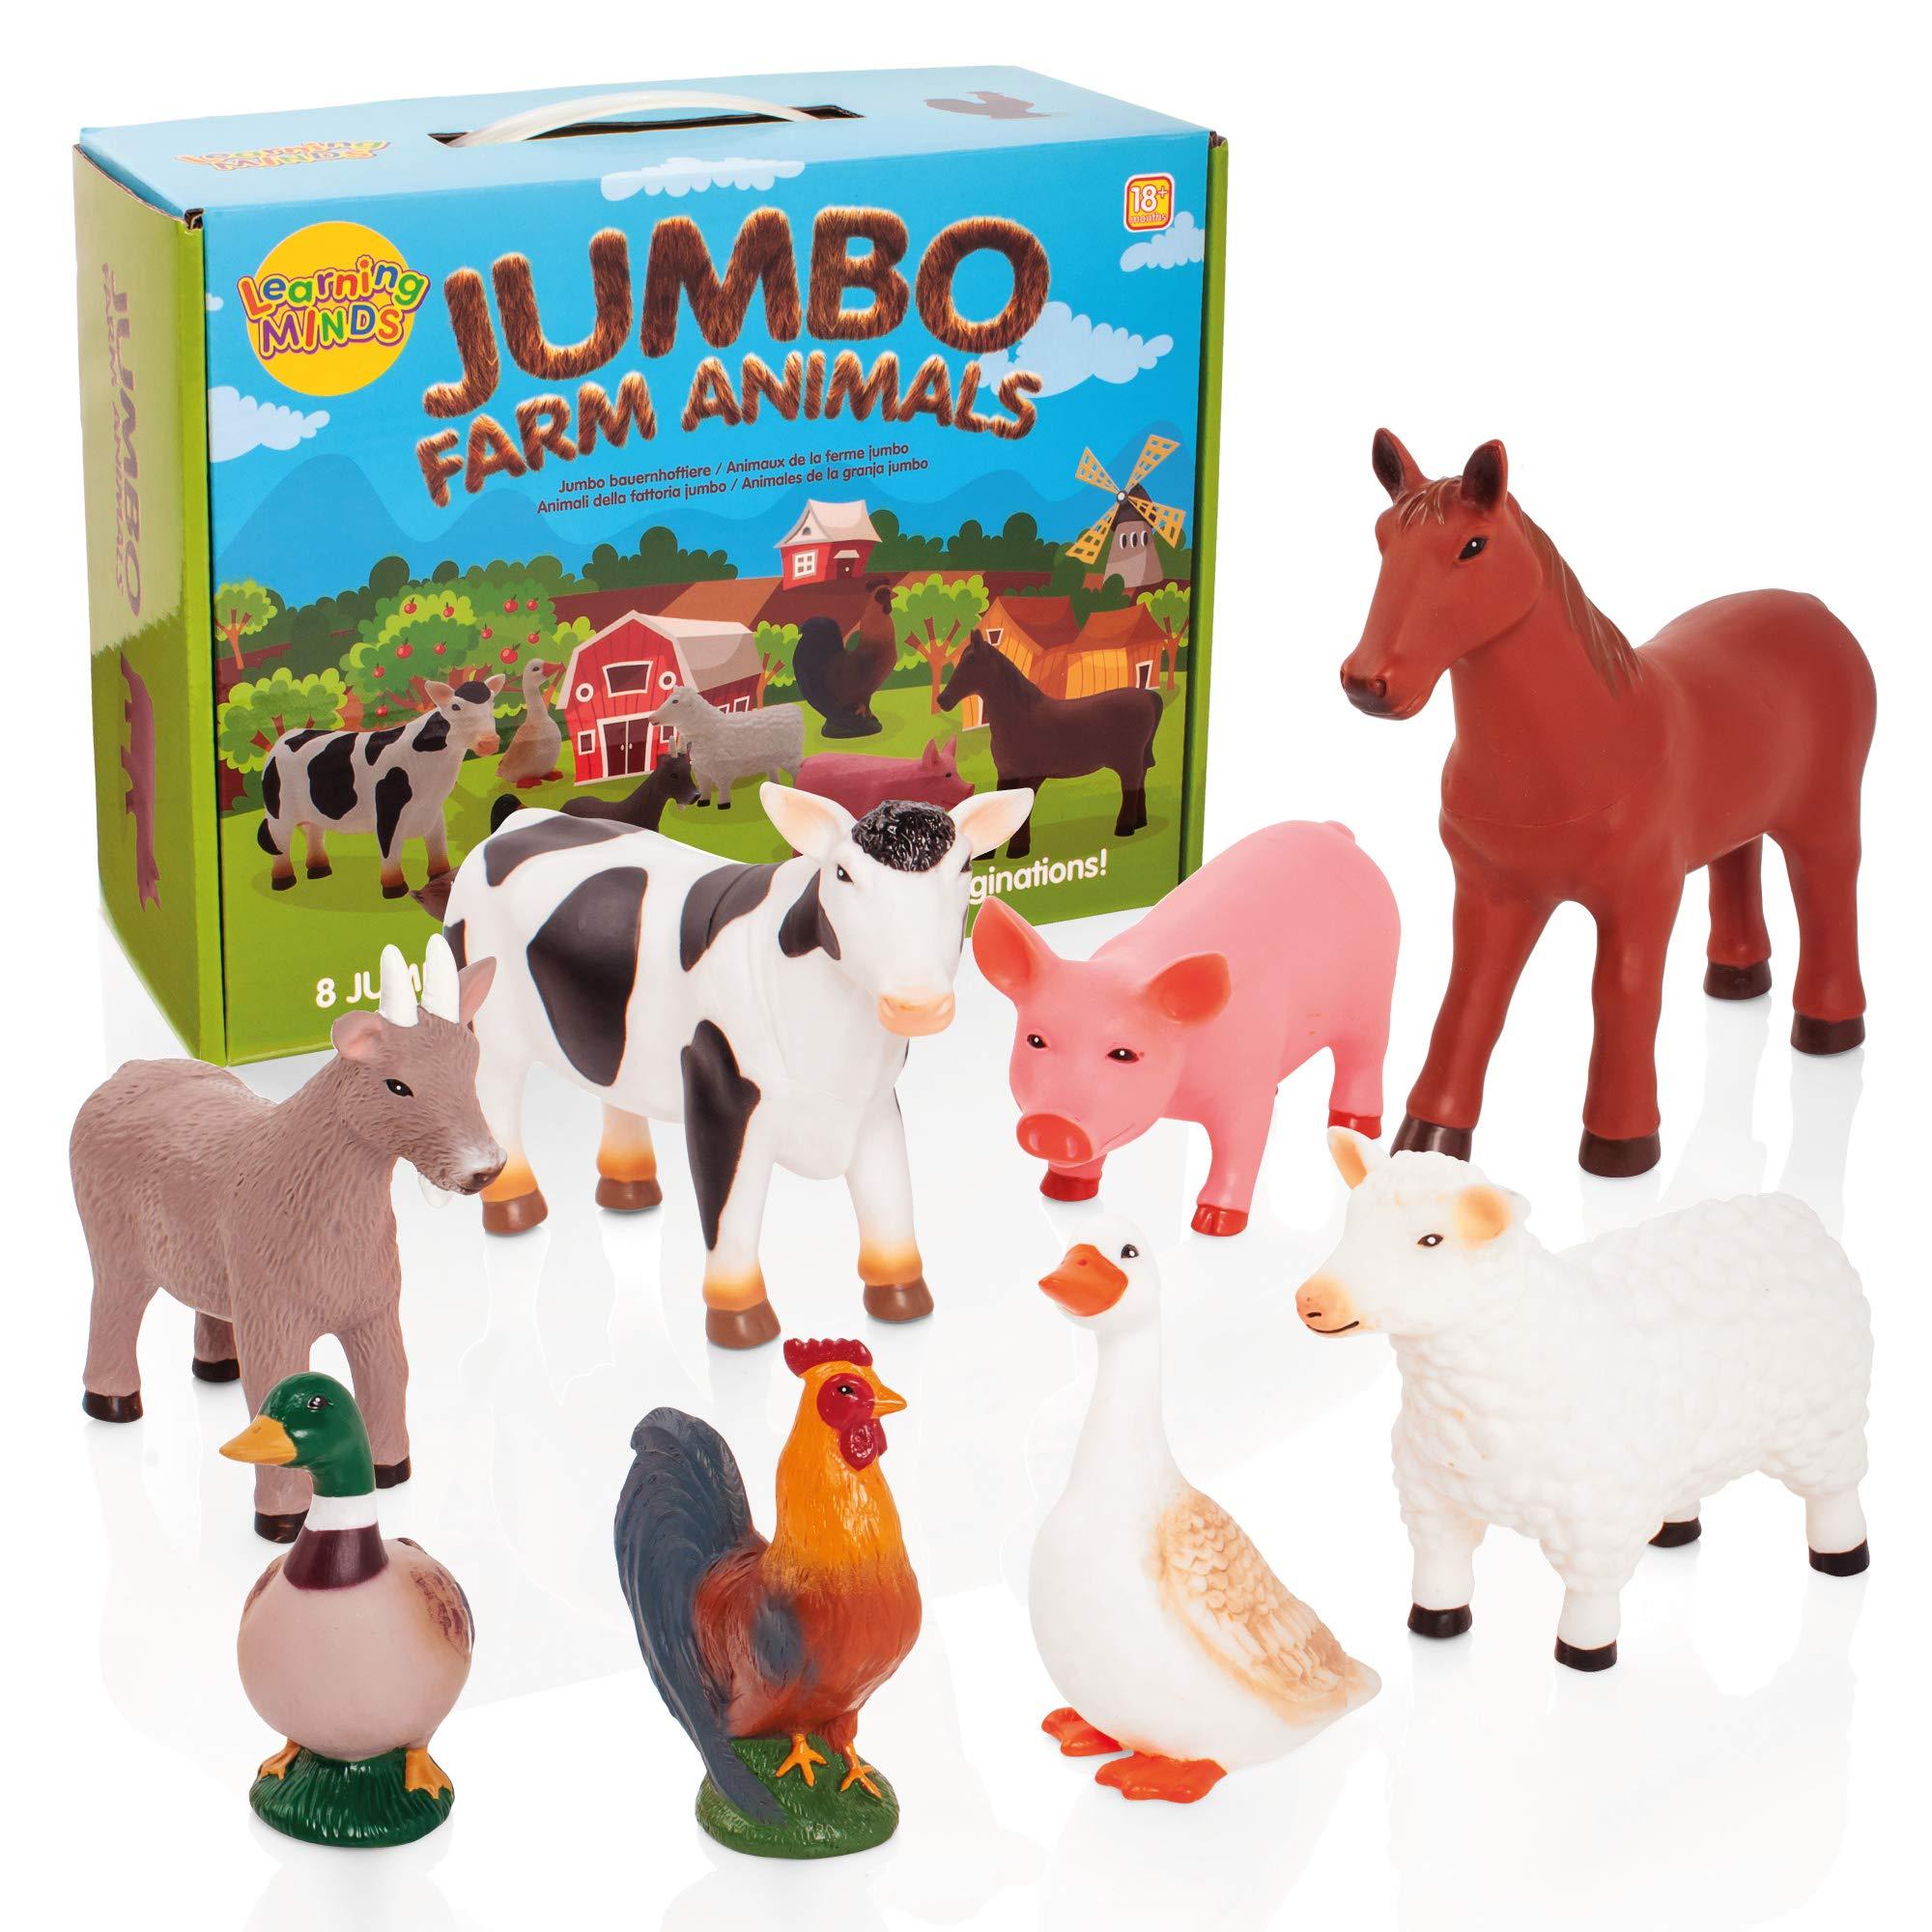 Learning Minds Jumbo Farm Animals, 8 Piece Animal Pretend Play Educational Toy Set